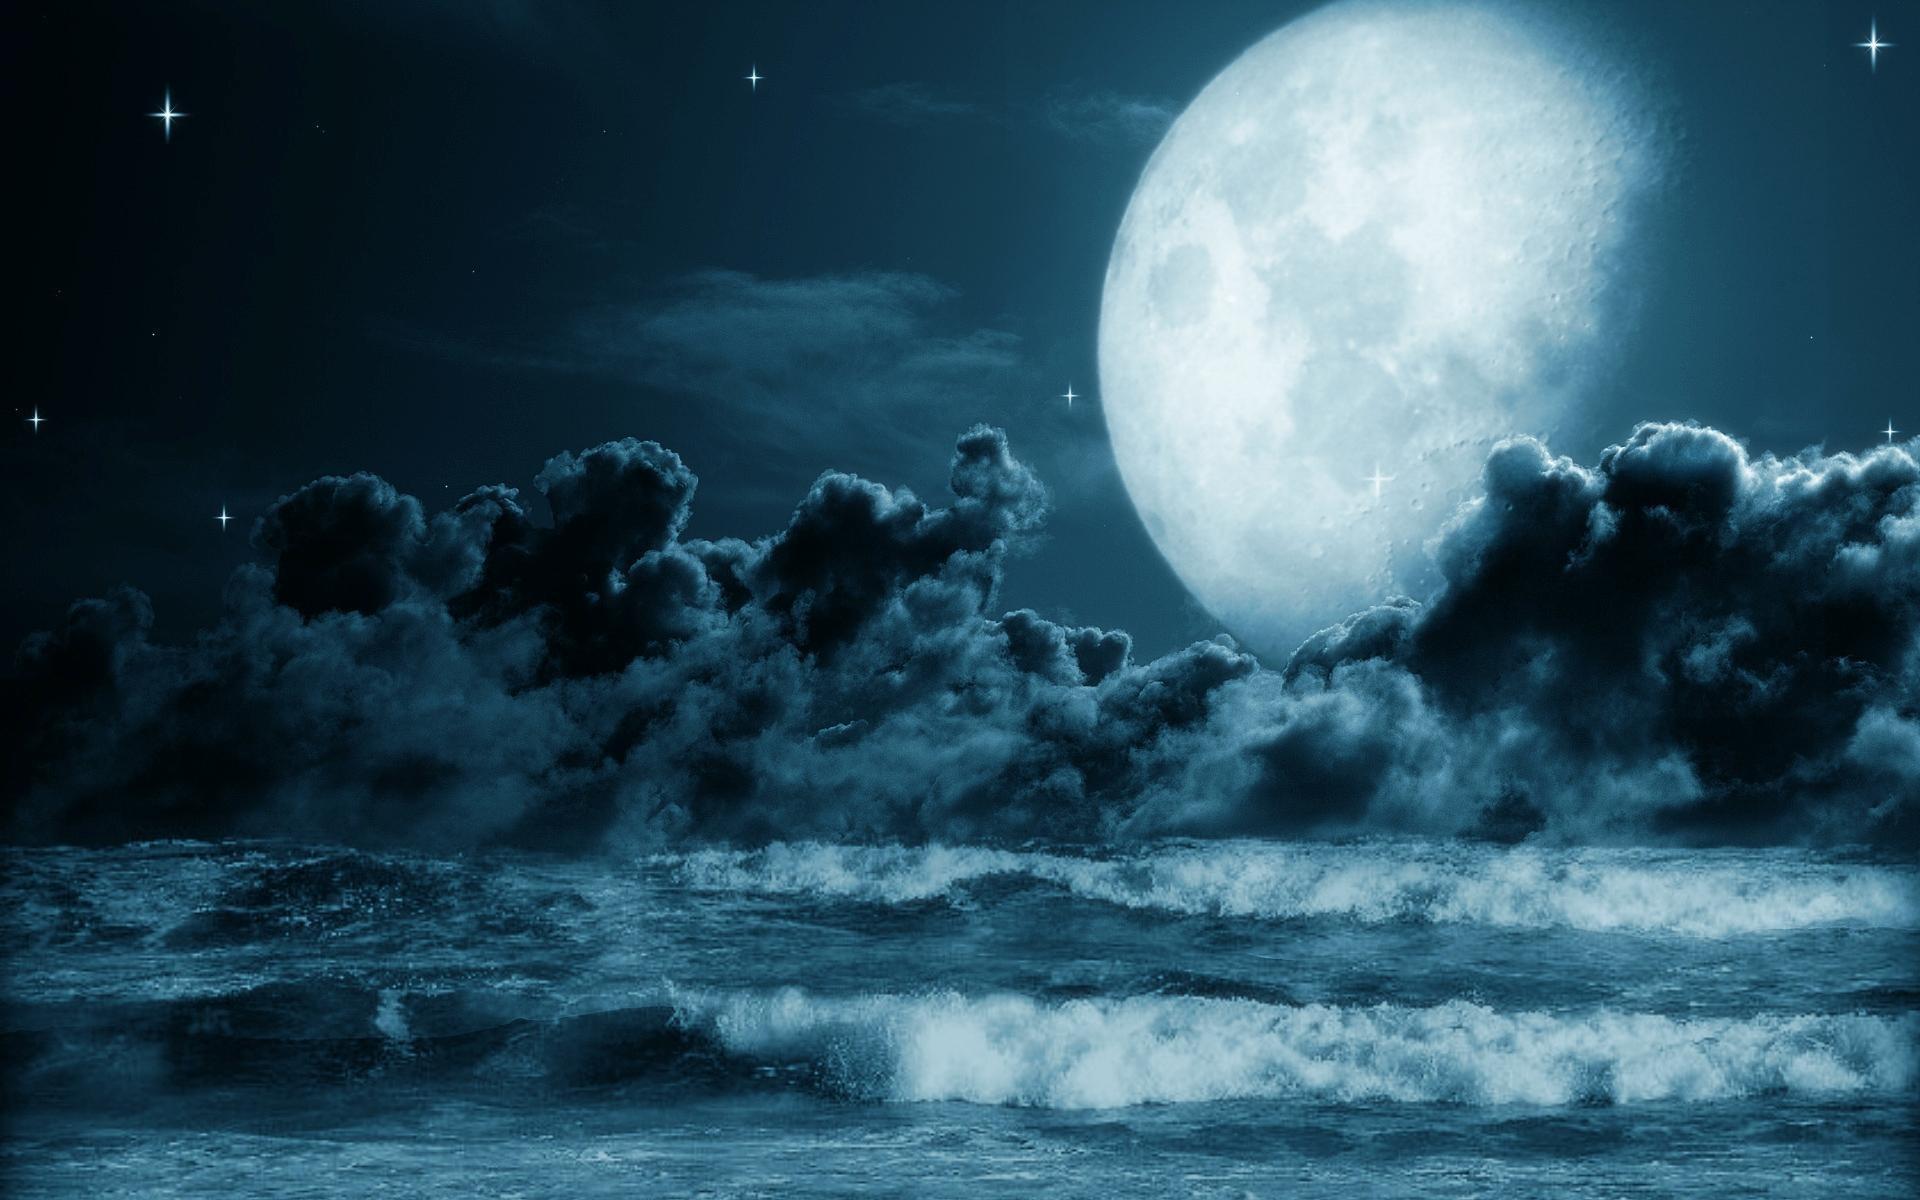 Oceanic Full Moon Night